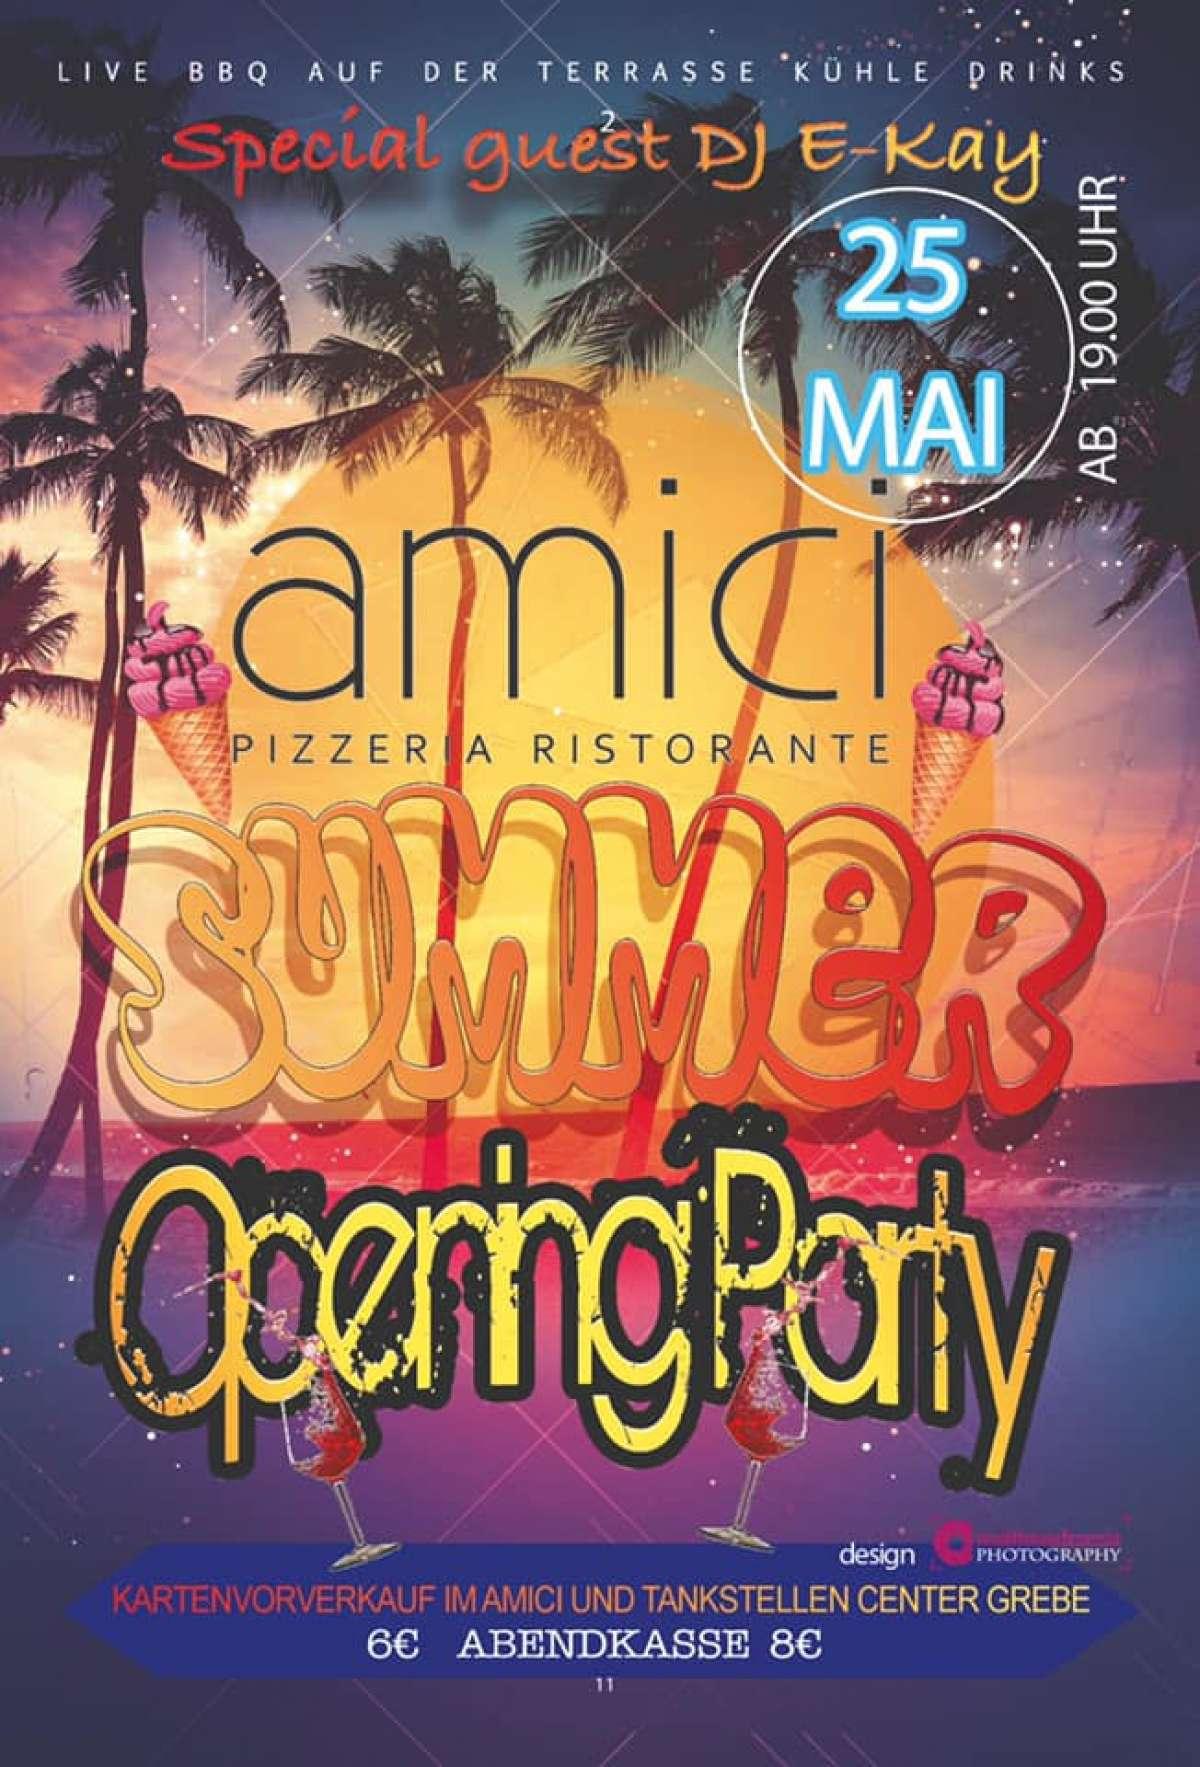 Summer Opening Party - DJ E-Kay - Amici  - Korbach